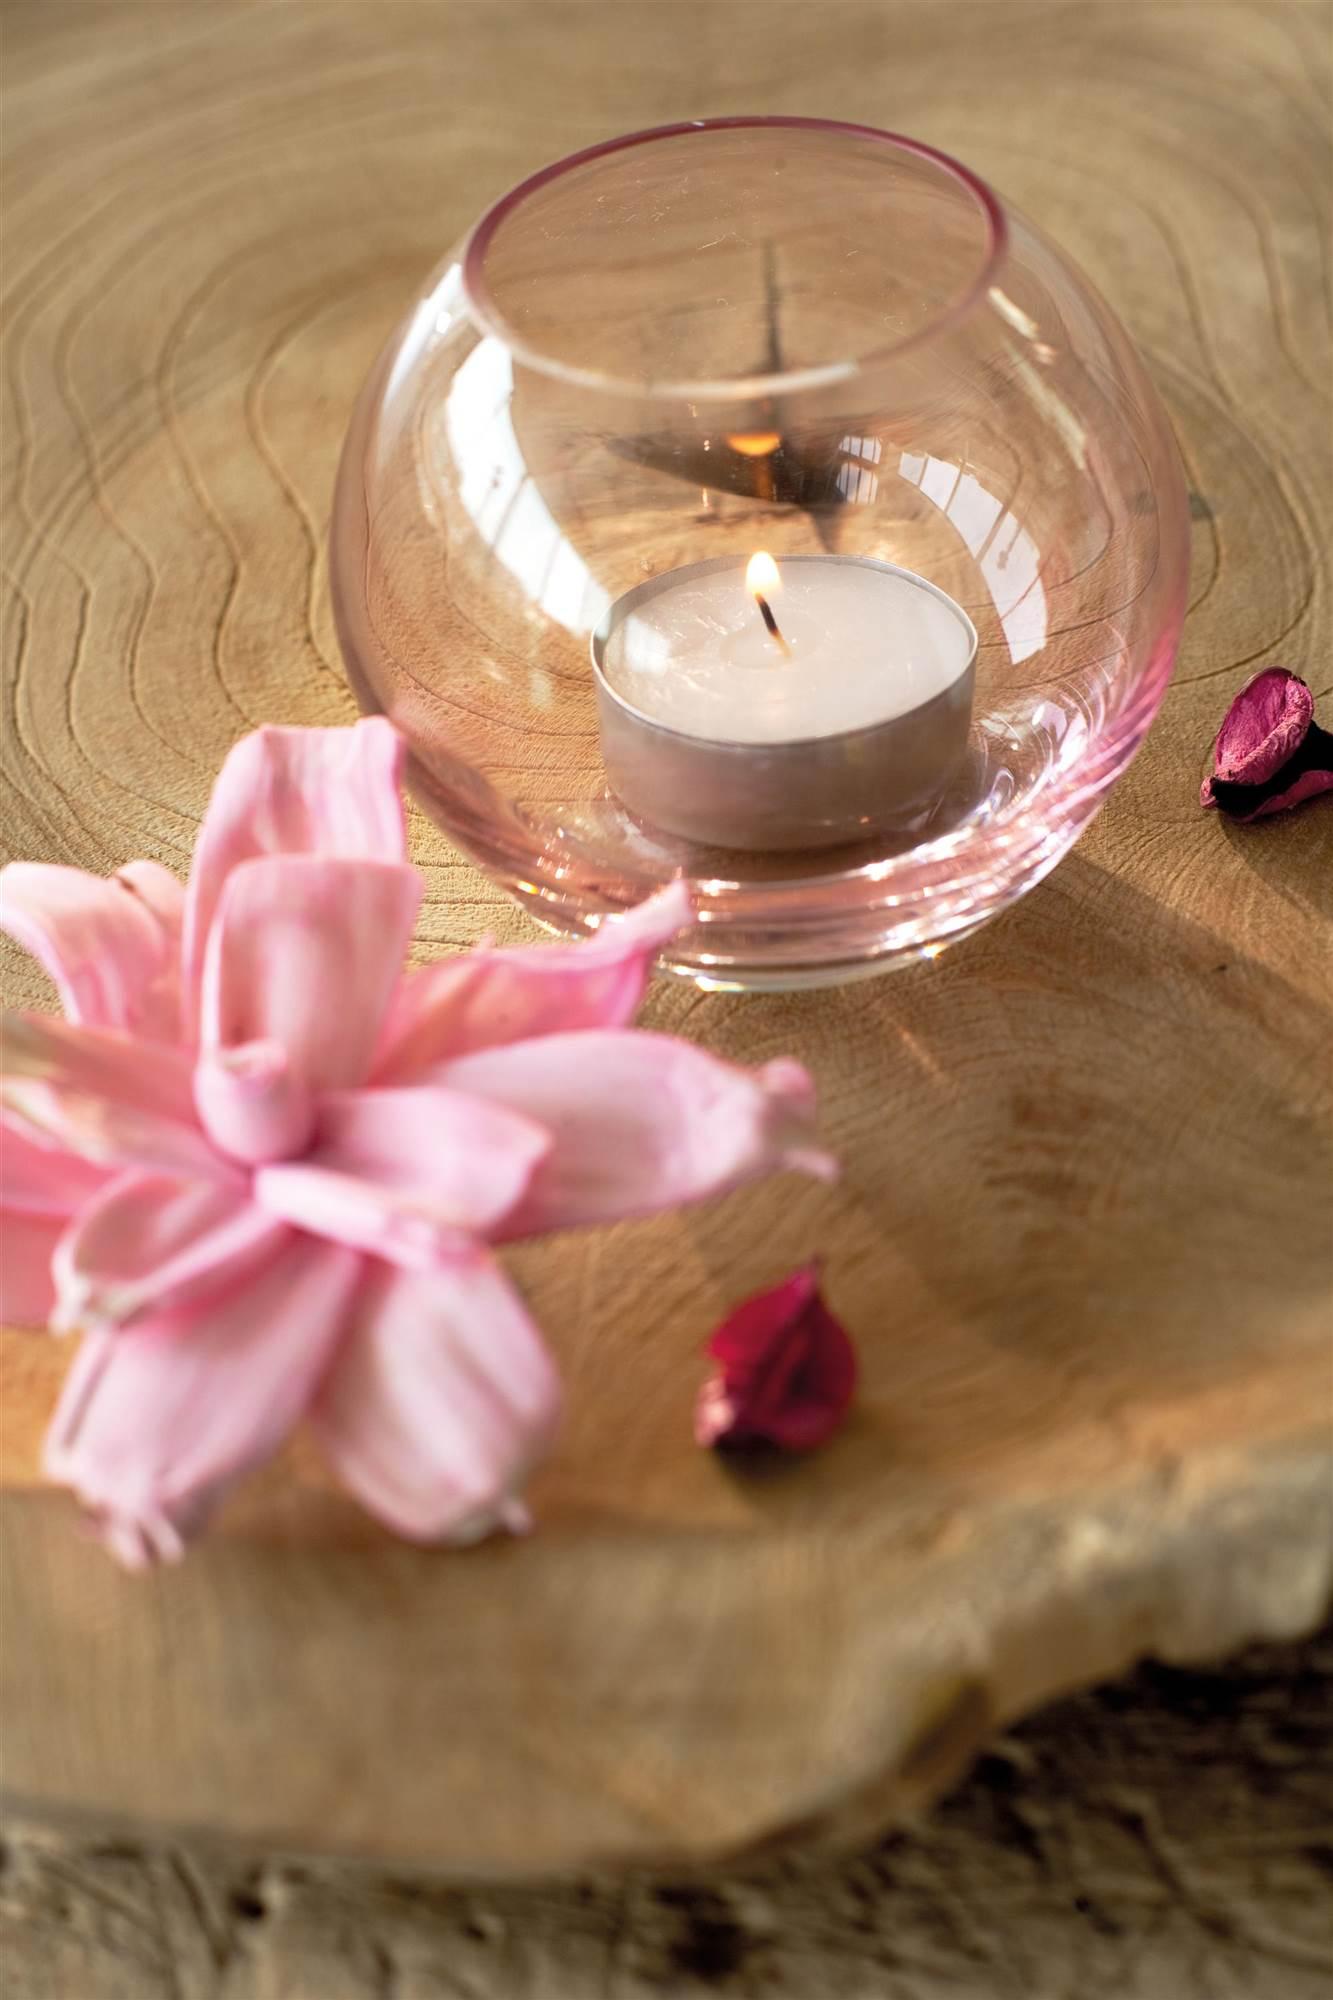 14 detalles para celebrar el 14 de febrero san valent n - Detalles para cena romantica ...